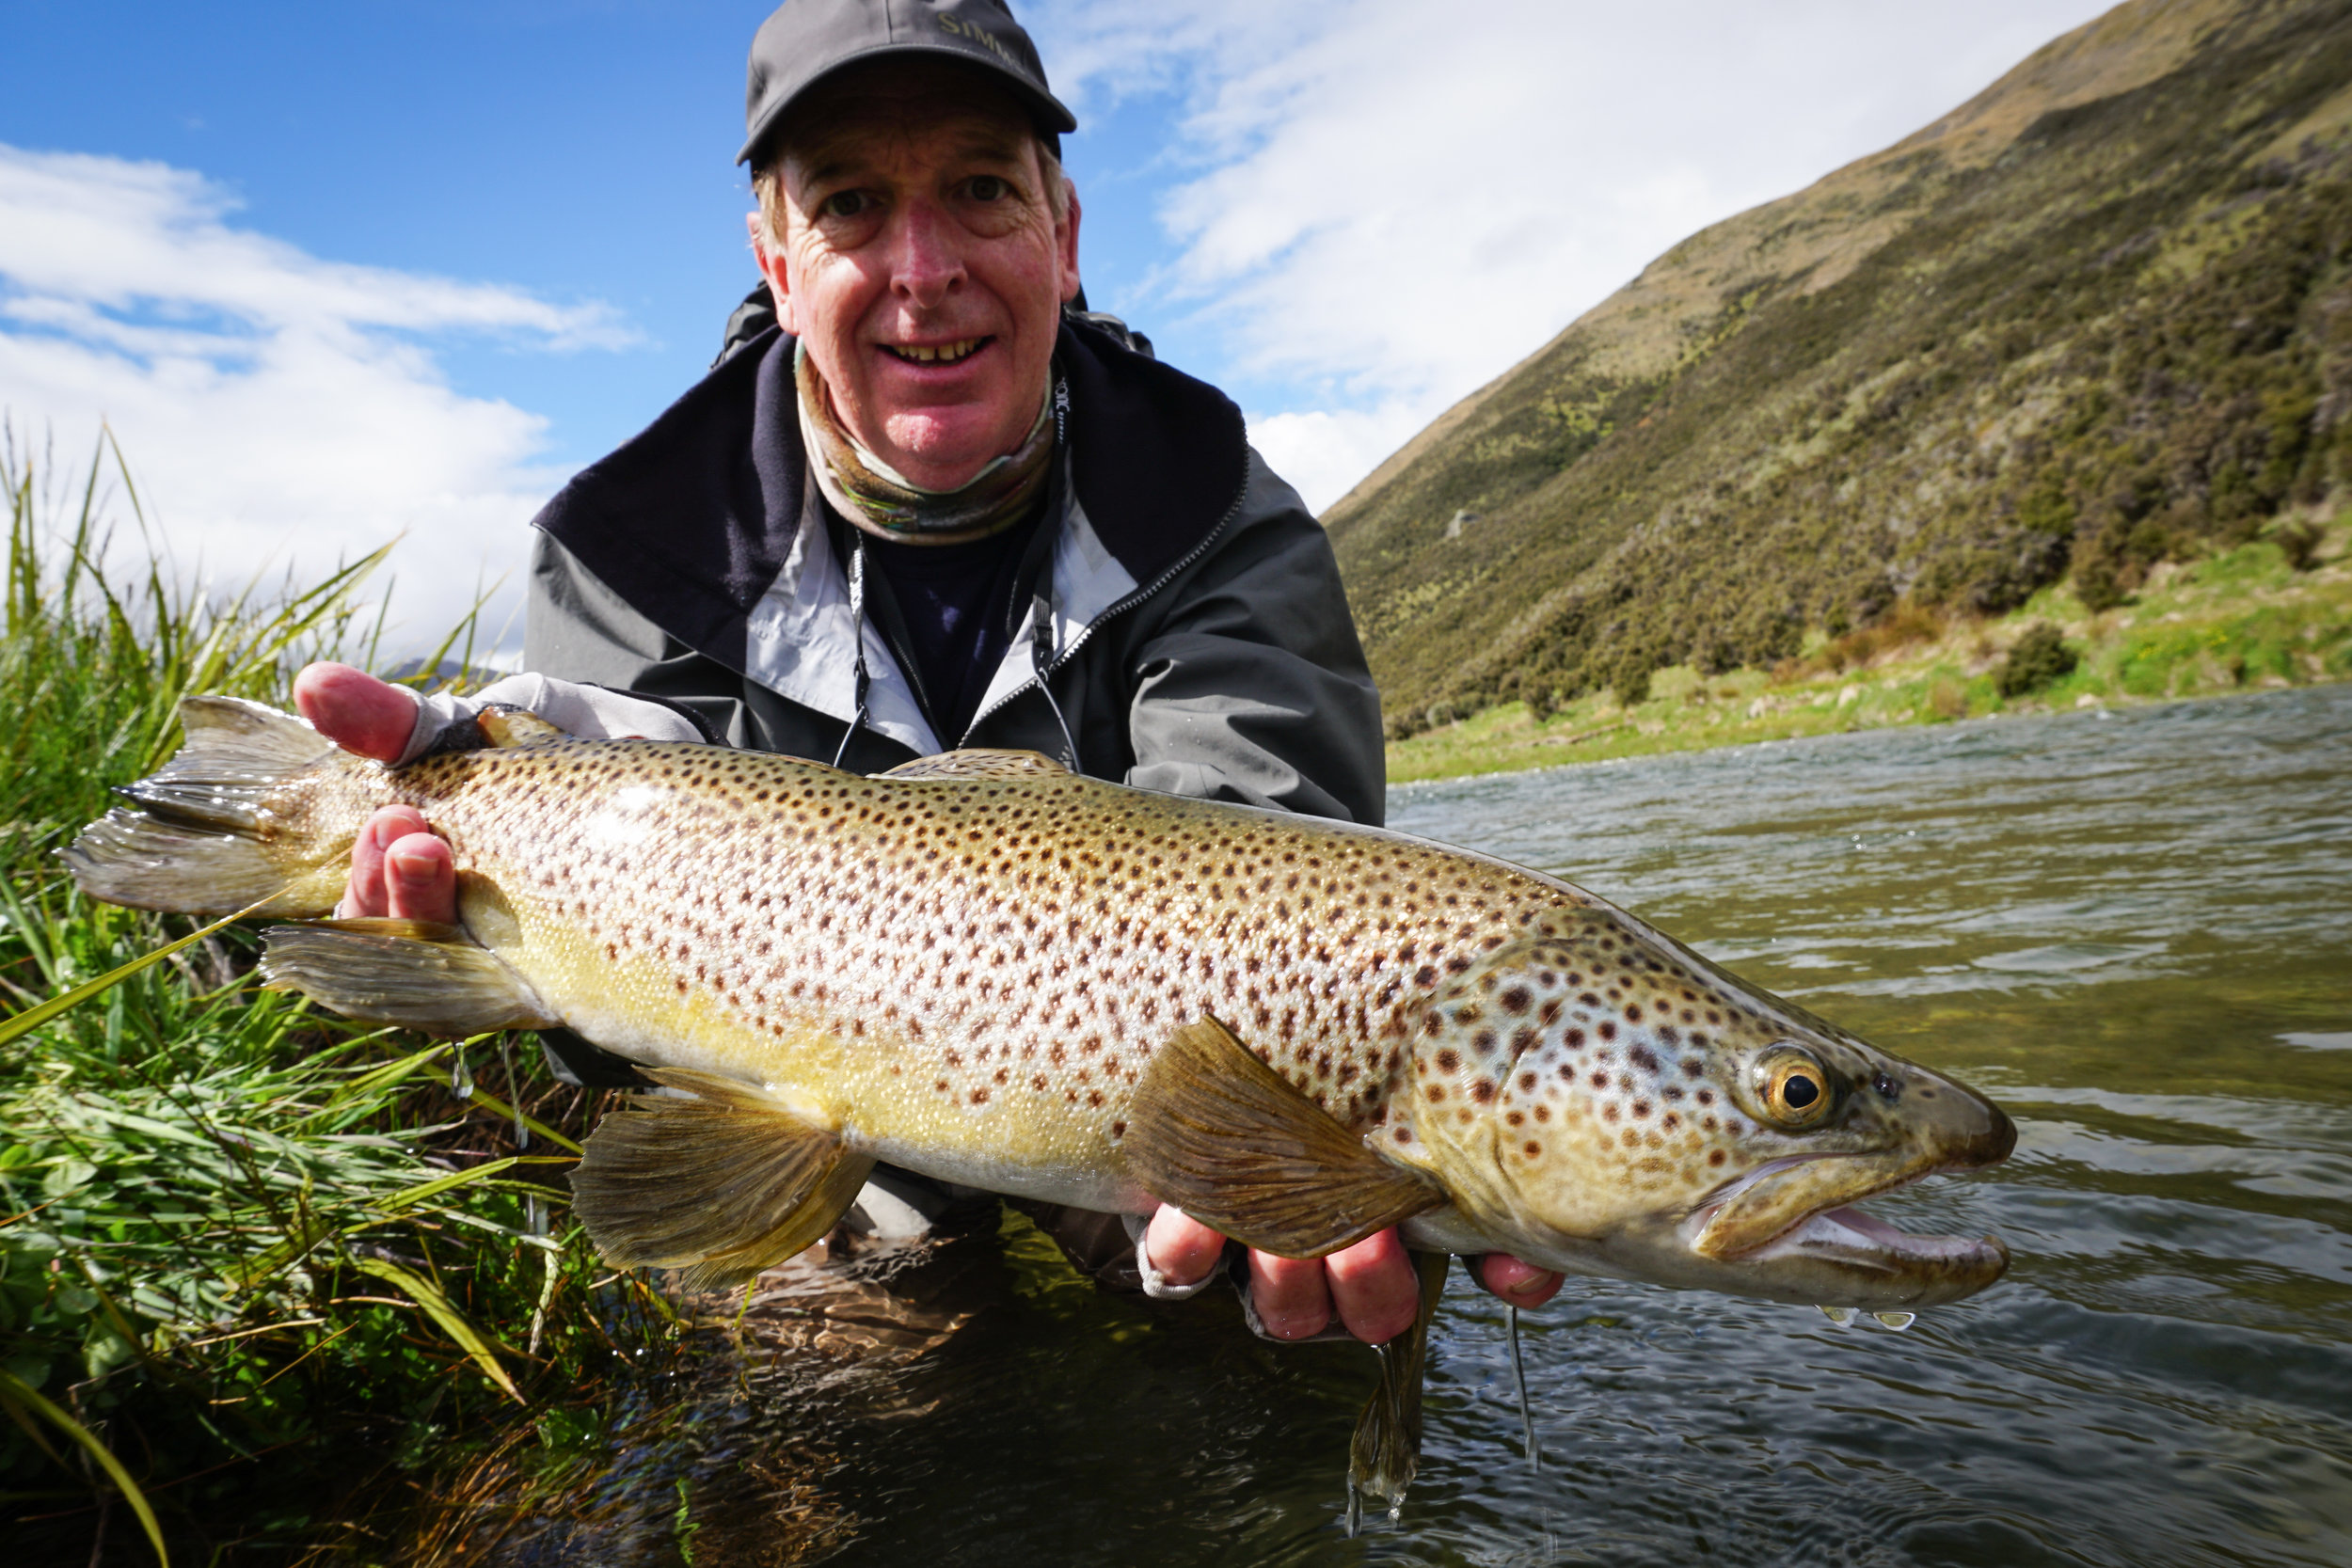 Australian fly fisherman enjoying New Zealand